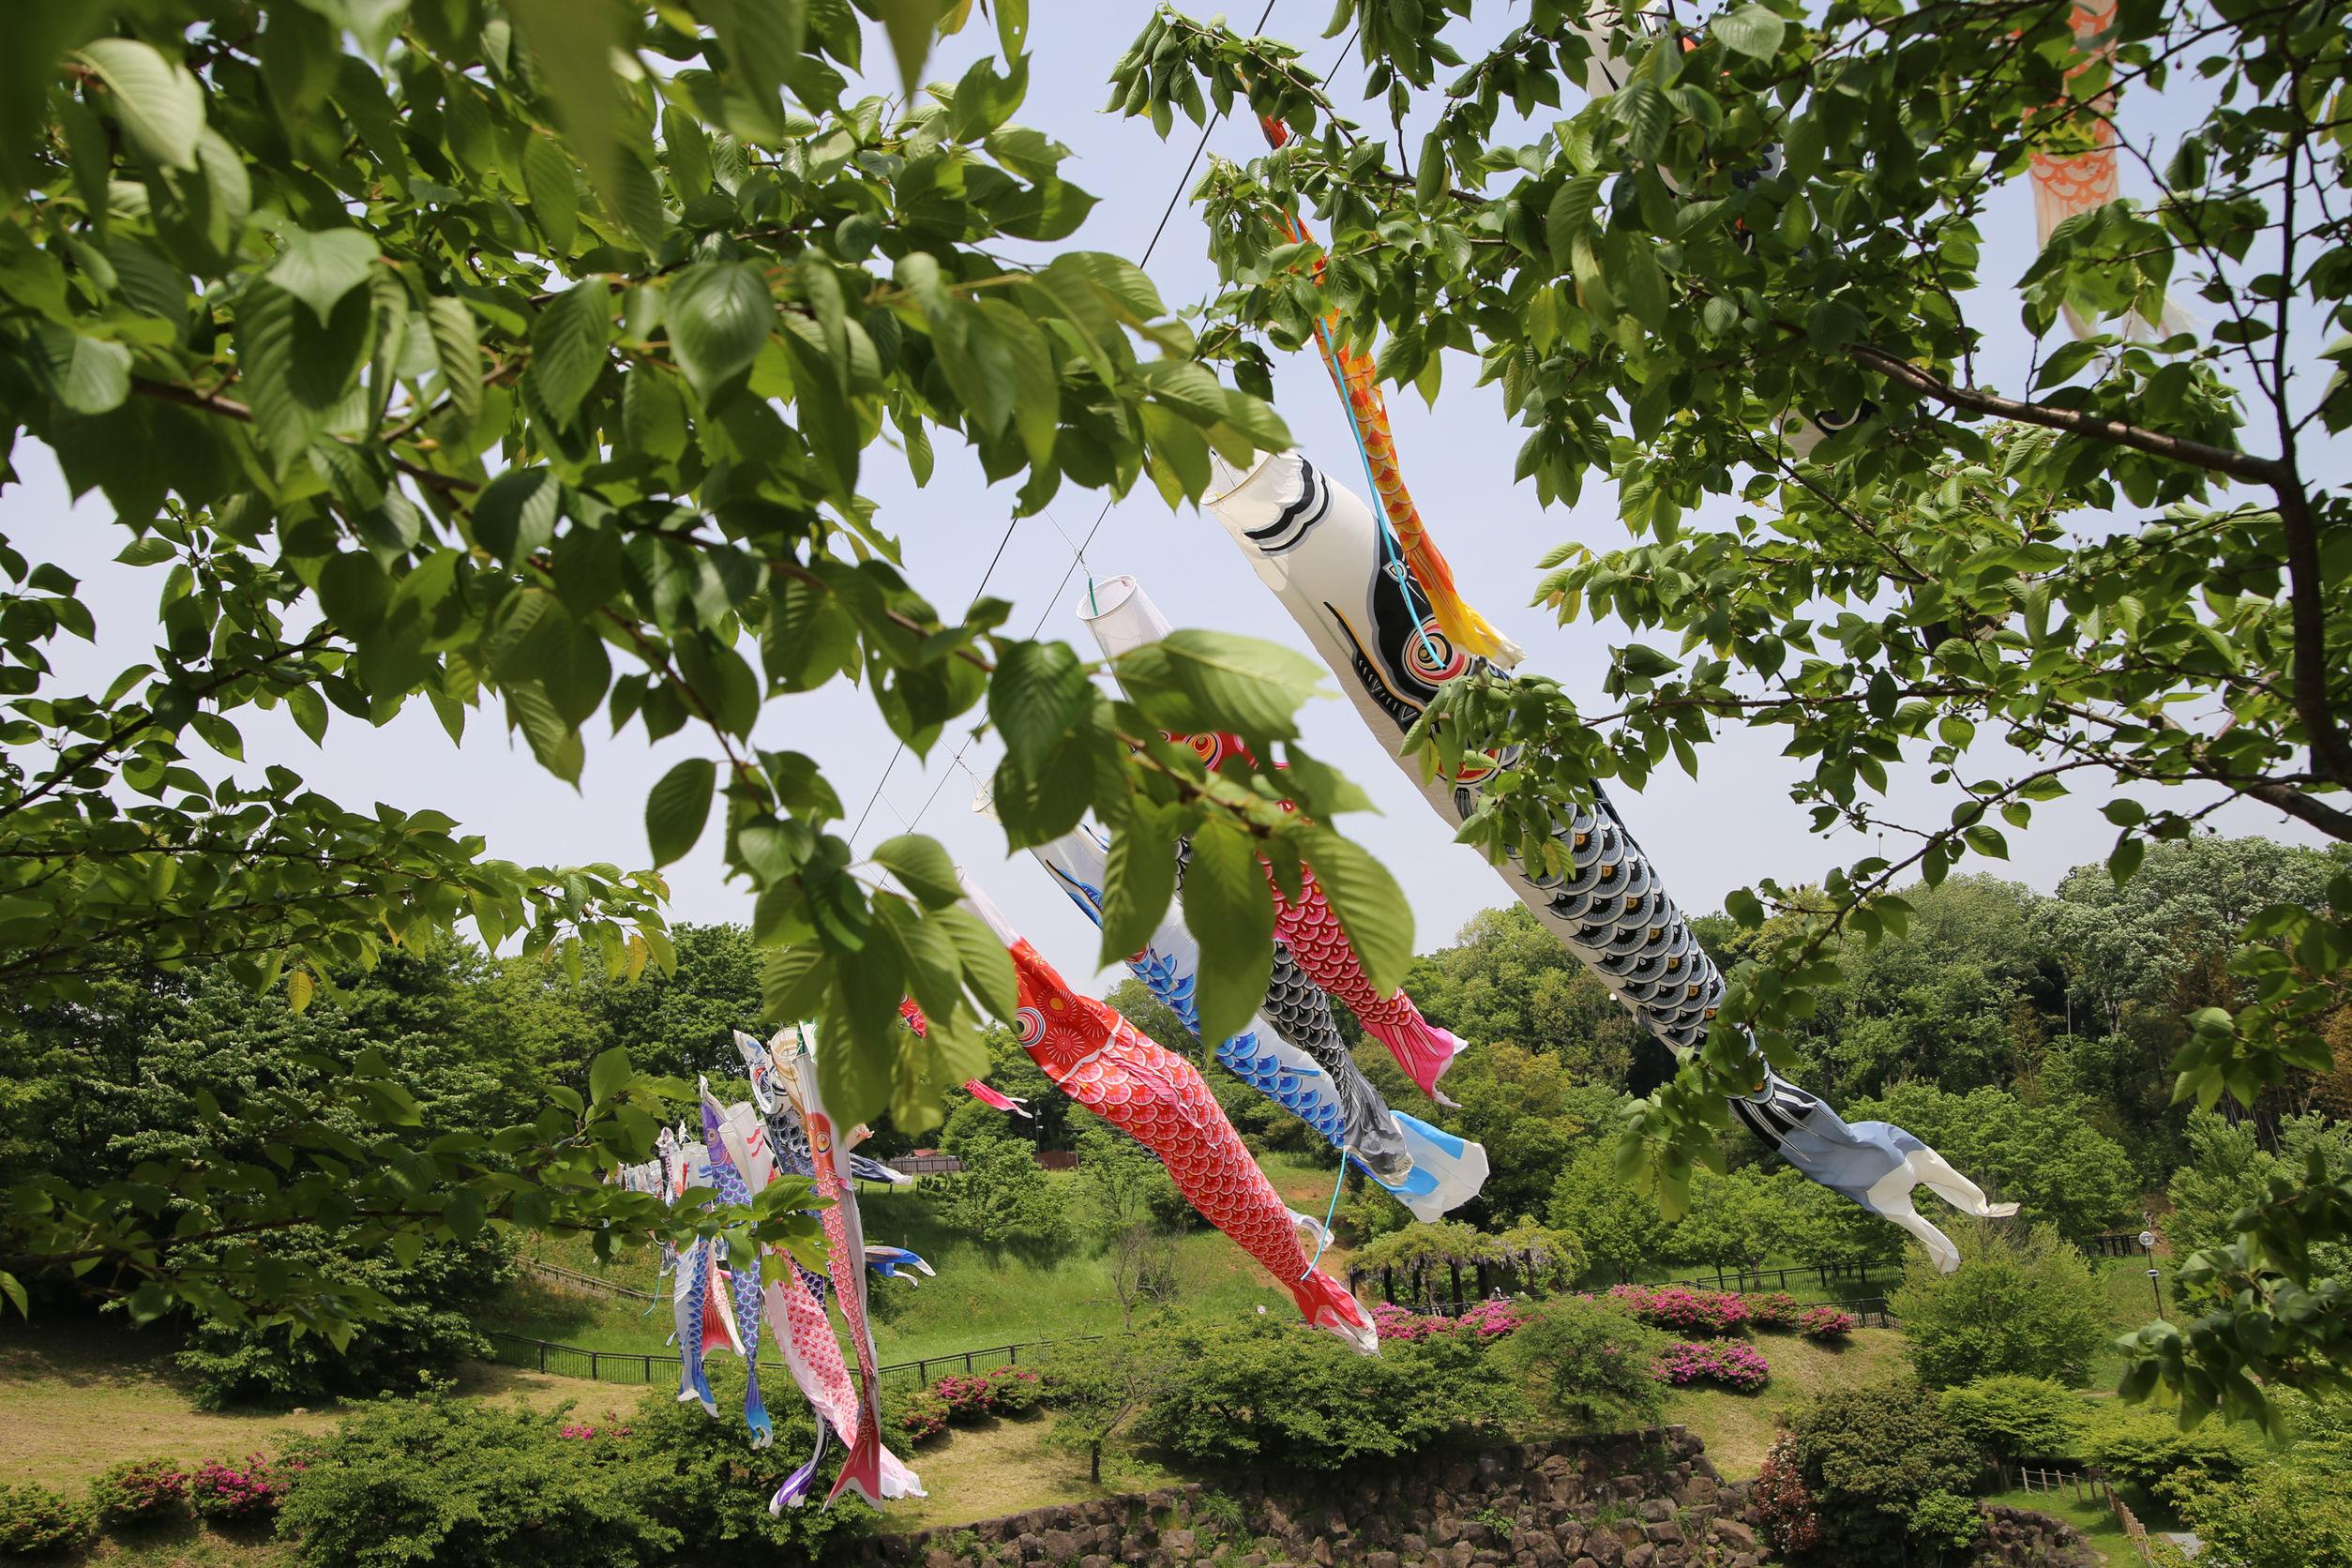 carp streamer celebration Ōgata Renkyū